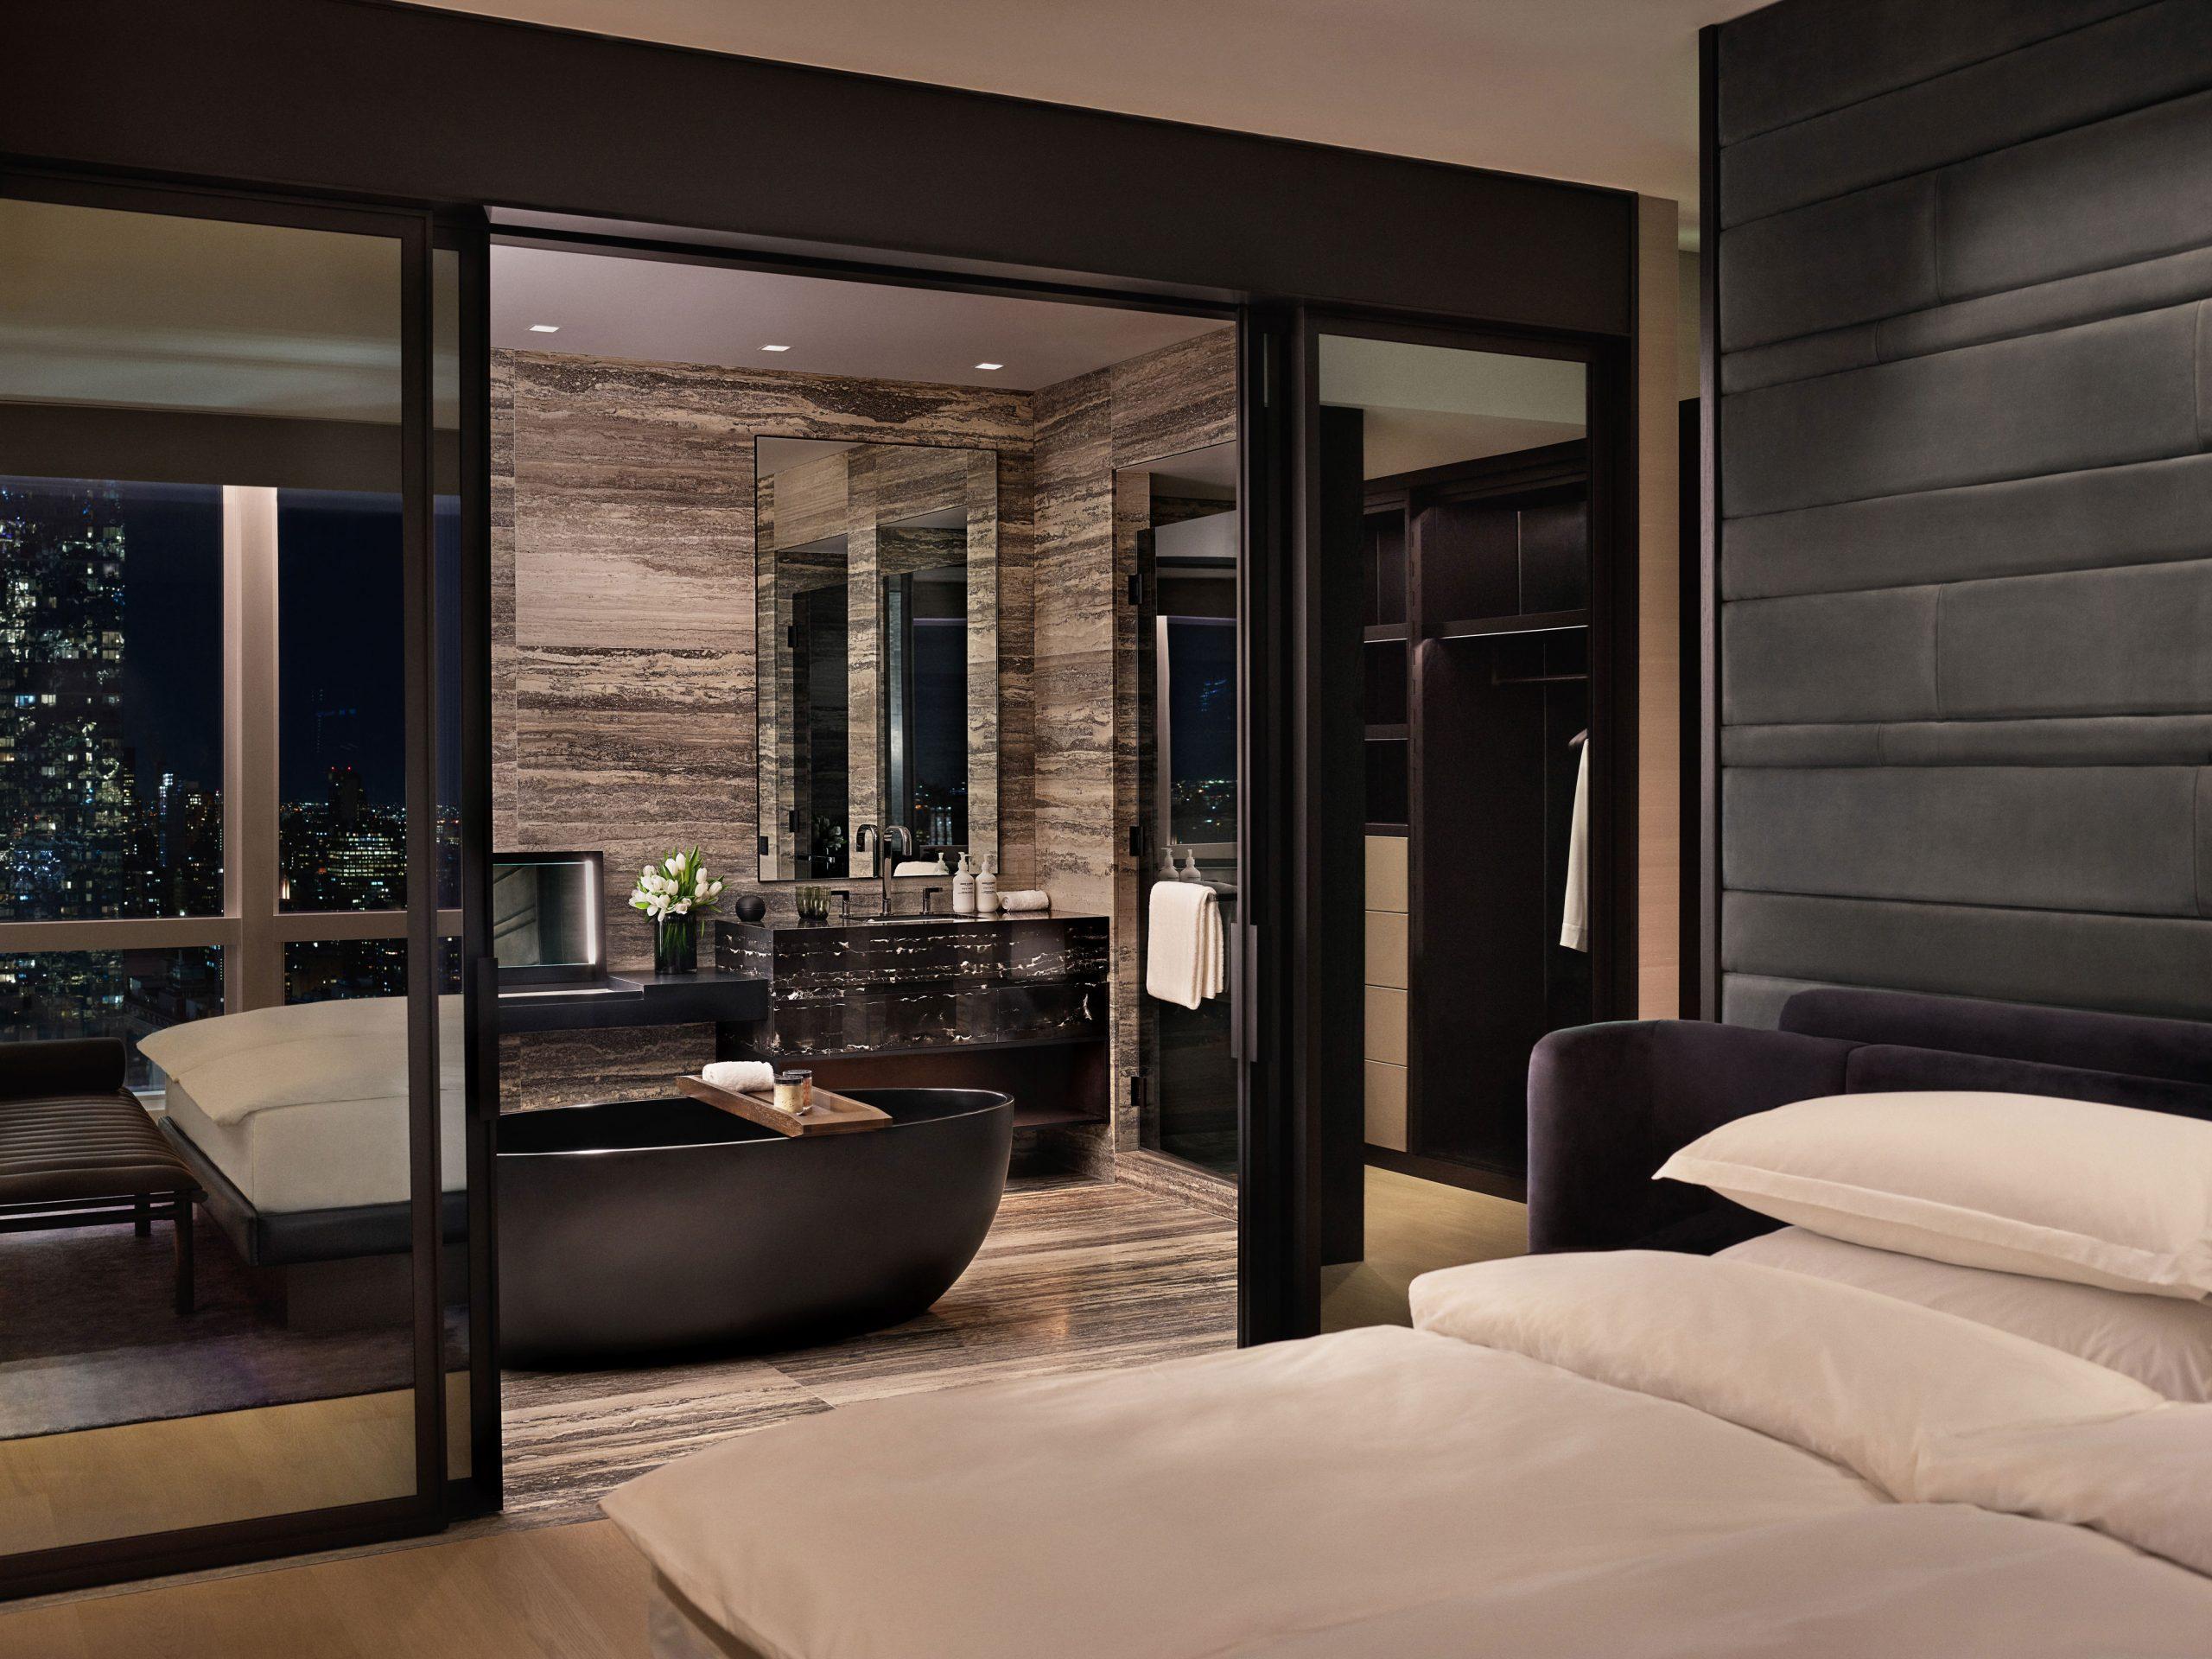 equinoxsuite-bathroom-bedroom-mfrzd-scaled